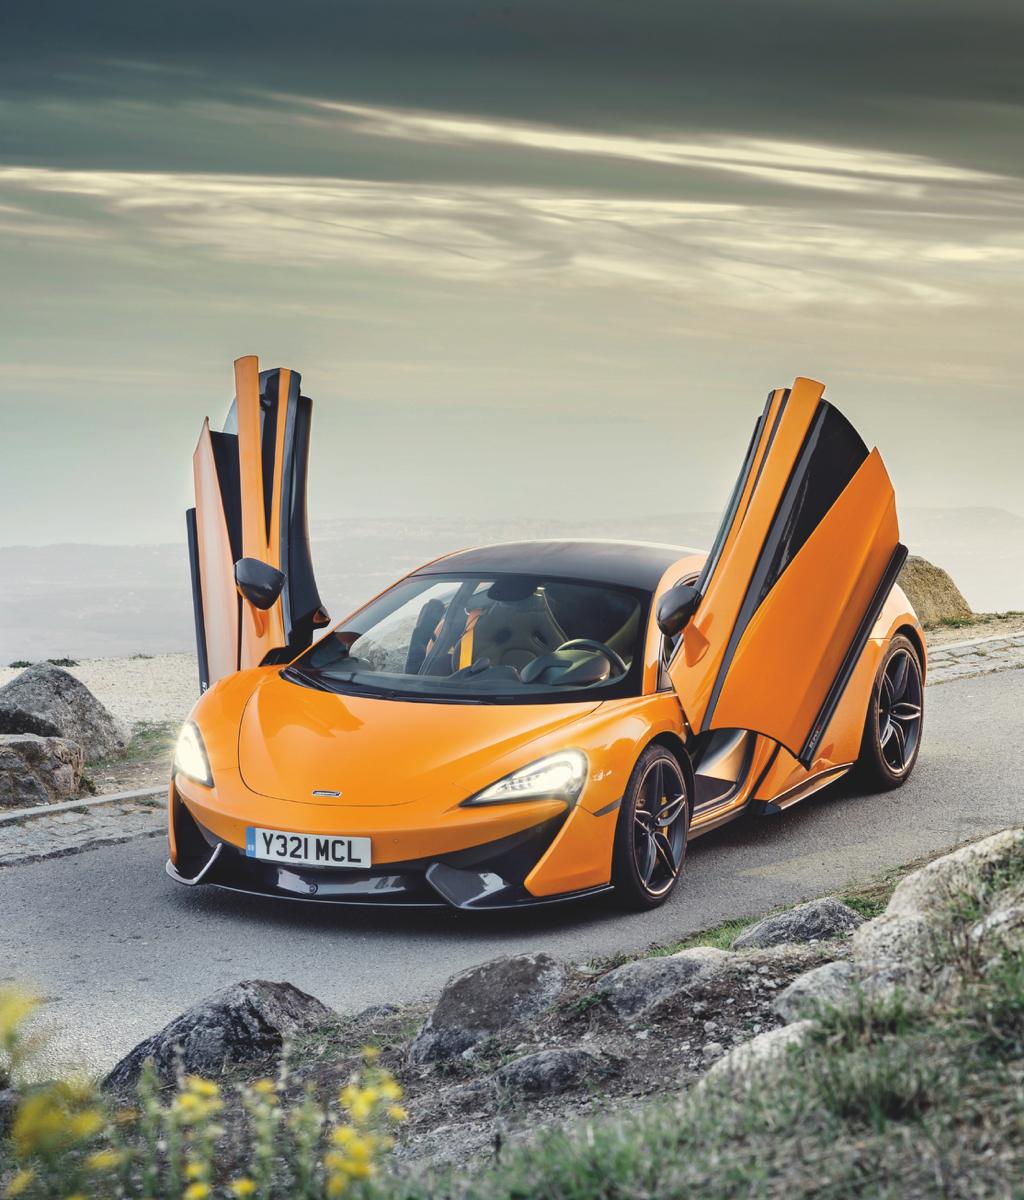 T H I S I S N O T A S U P E R C A R & McLaren 570S Review